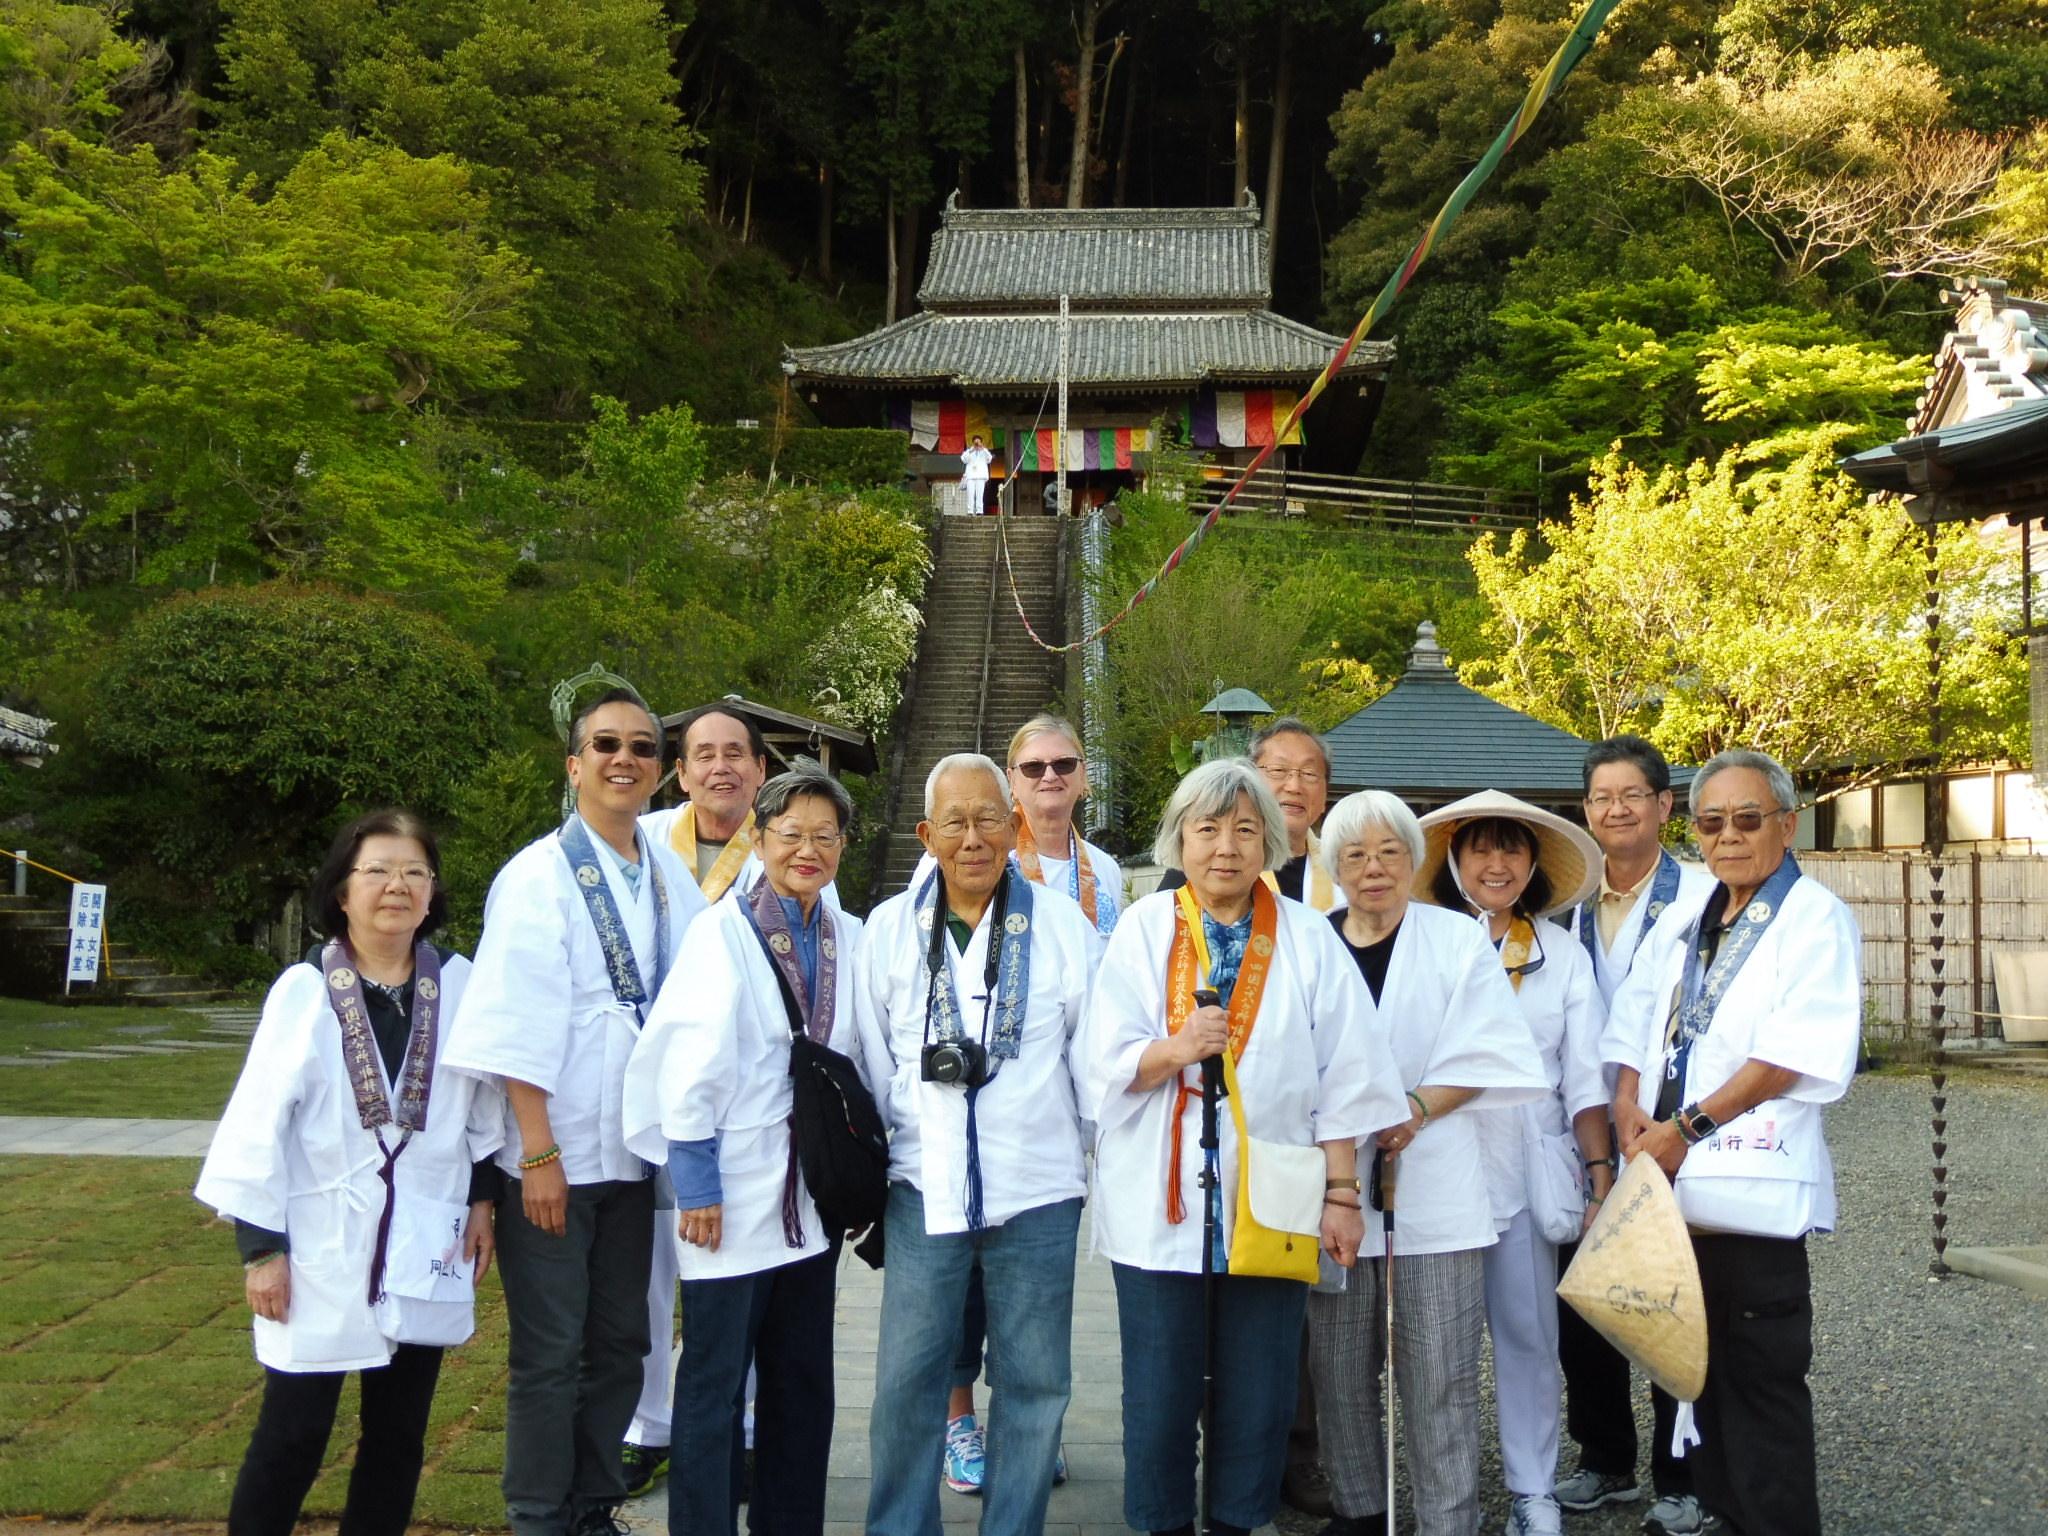 Shikoku OHENRO pilgrimage vol. 2  Visiting temple No 33 to No 54 on vol. 2 tour, Including 3 Onsen   (Kochi, Matsuyamna, Dogo Onsen, Imabari) October 30 (Tue) ~ November 08 (Thu), 2018